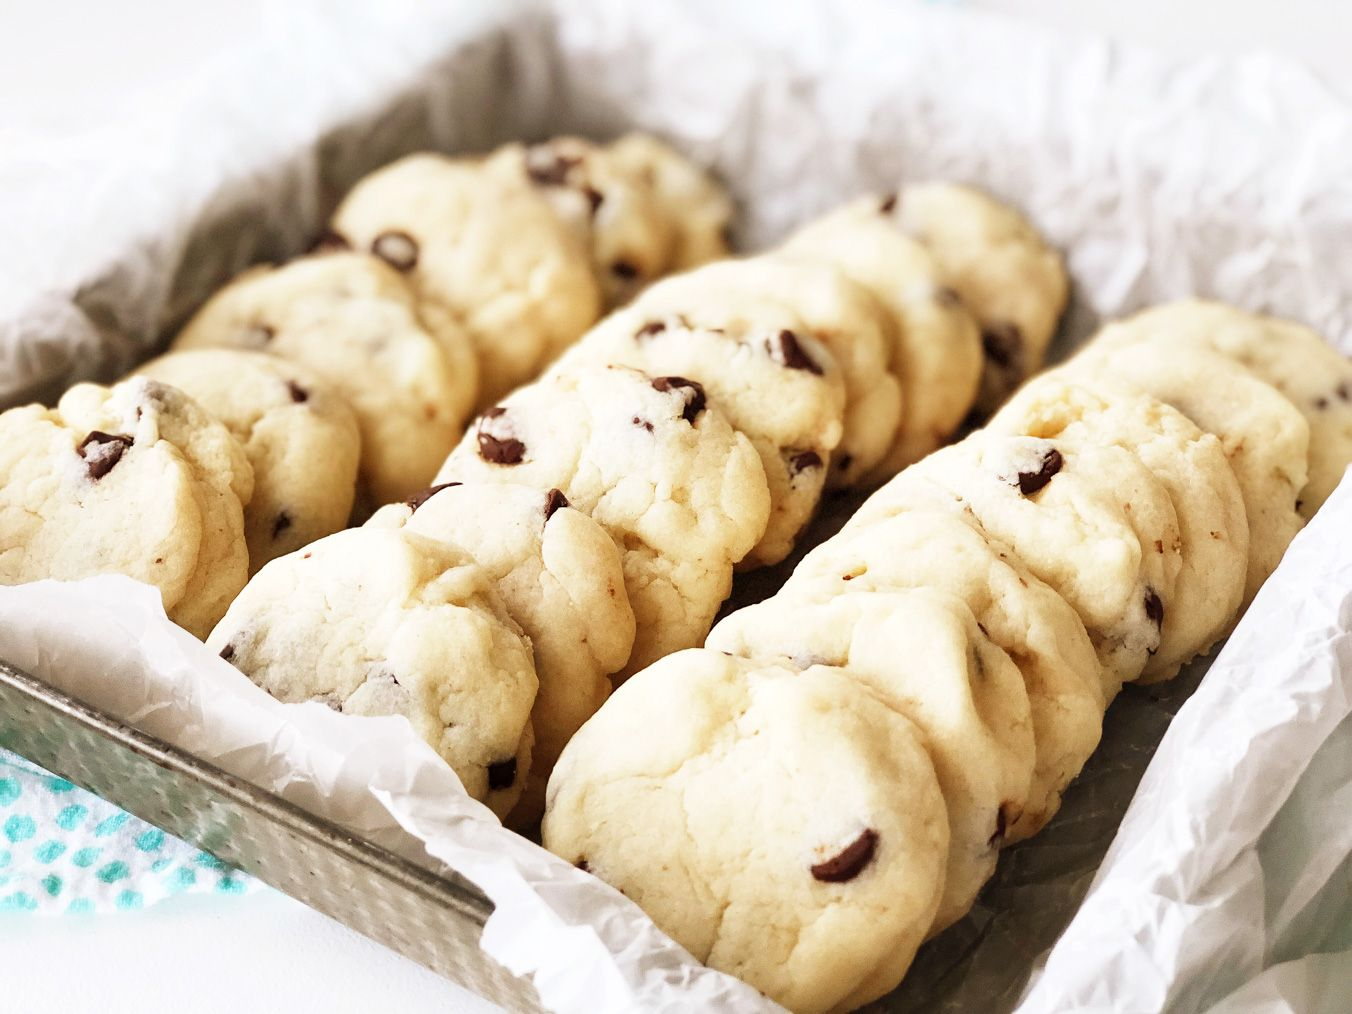 These Condensed Milk Chocolate Chip Cookies Taste Like A Shortbread Cookie In 2020 Milk Chocolate Chip Cookies Chocolate Chip Cookies Sweetened Condensed Milk Recipes